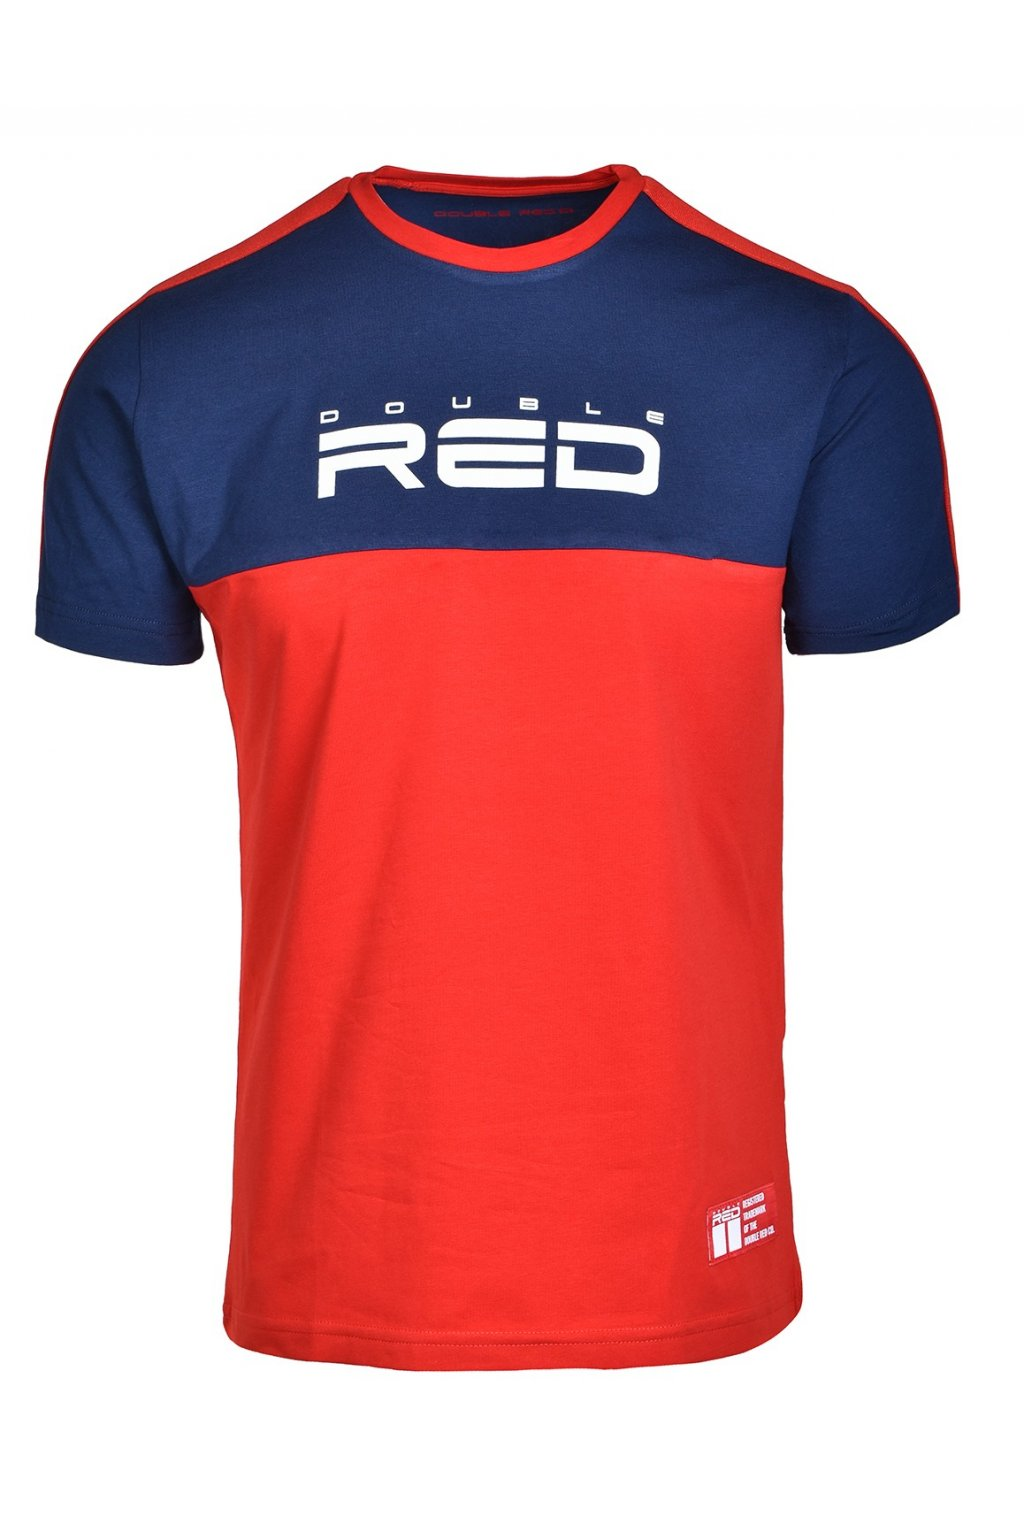 Double Red pánské triko OUTSTANDING obr1